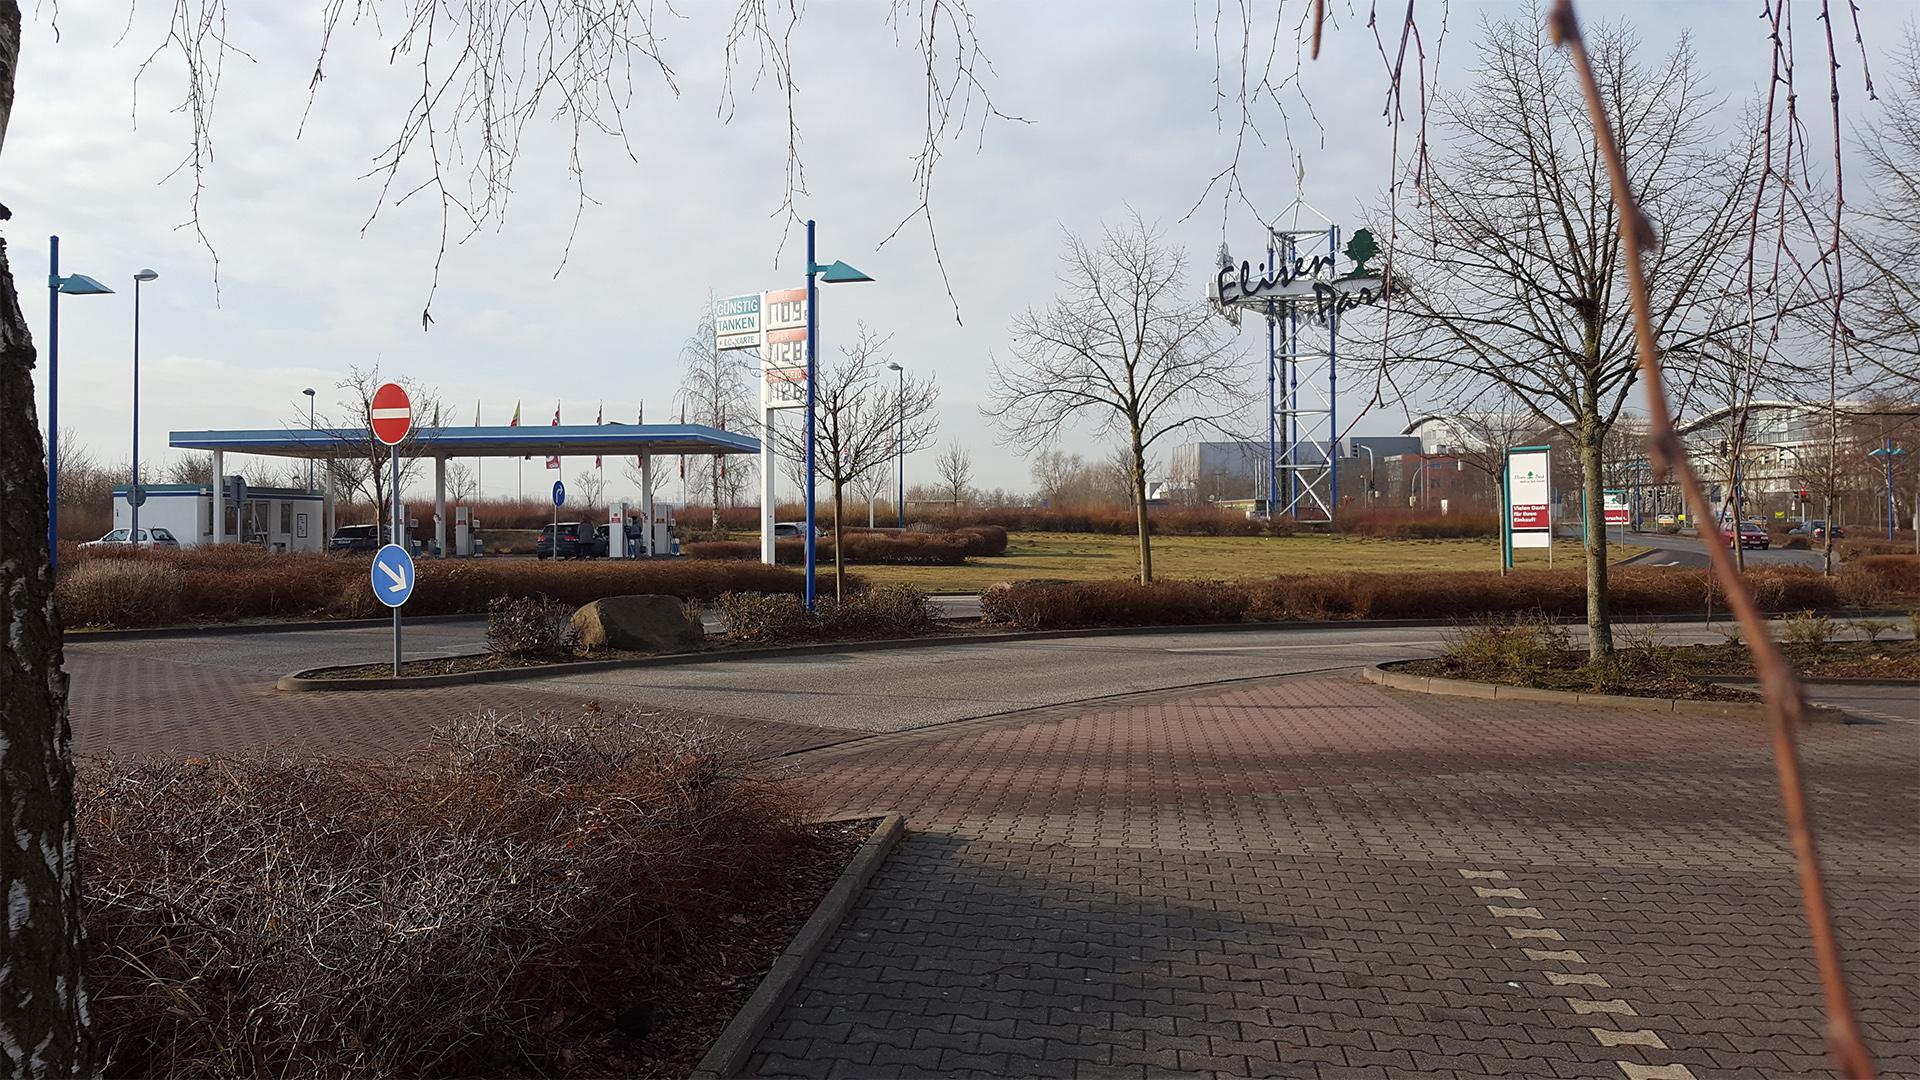 Vormittags am Elisenpark in Greifswald